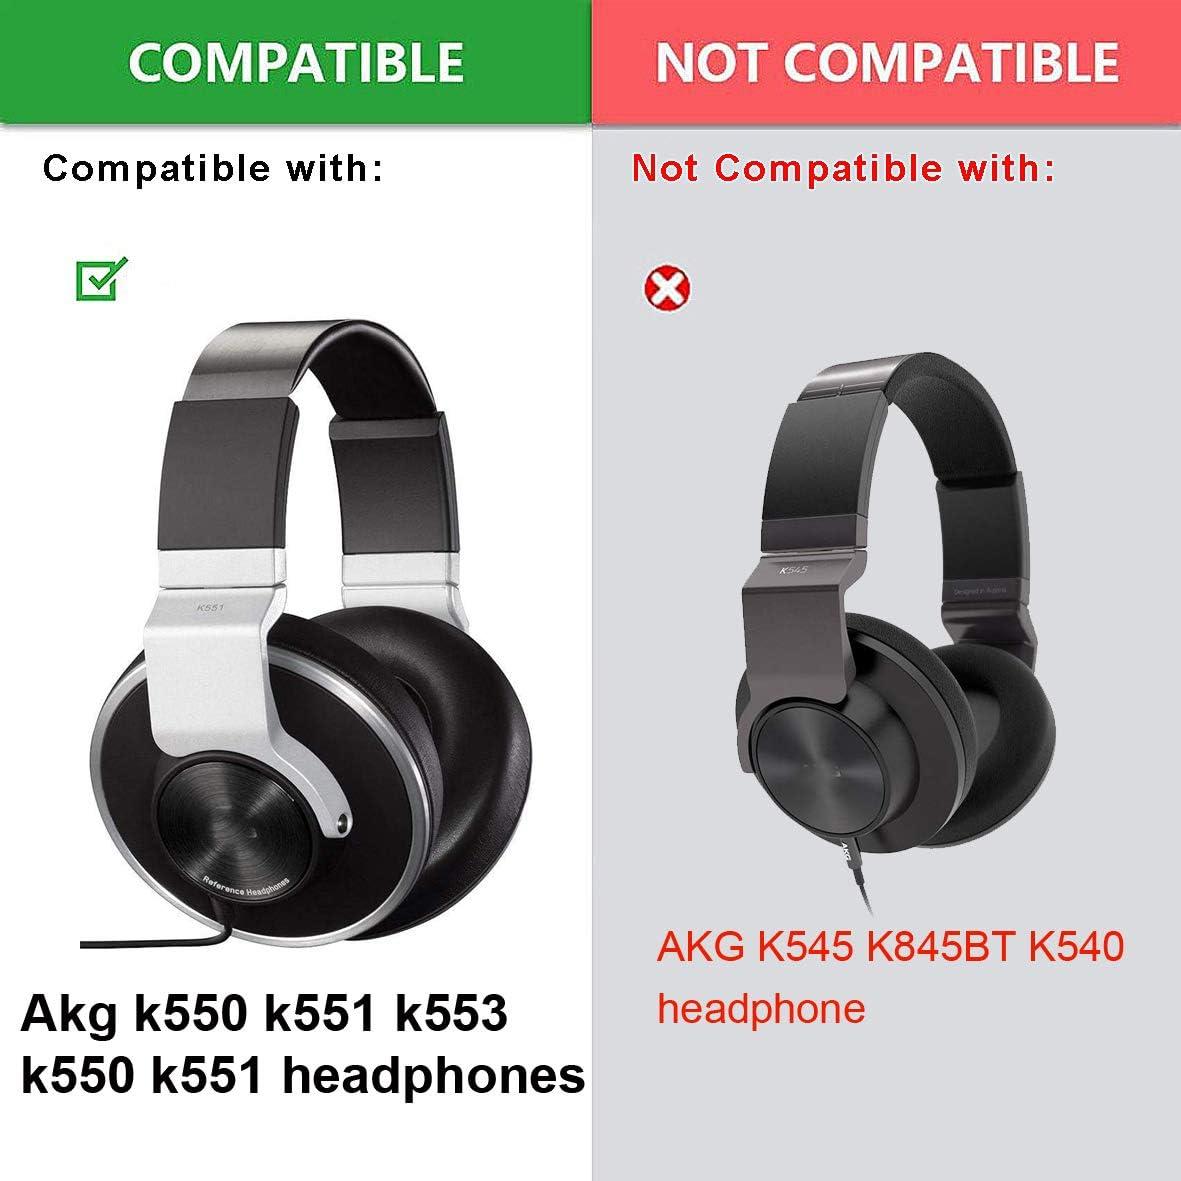 Headband Replacement Headband Ear Pads Foam Cushion Pillow Parts Cover for Akg k550 k551 k553 k 550 551 Headphones